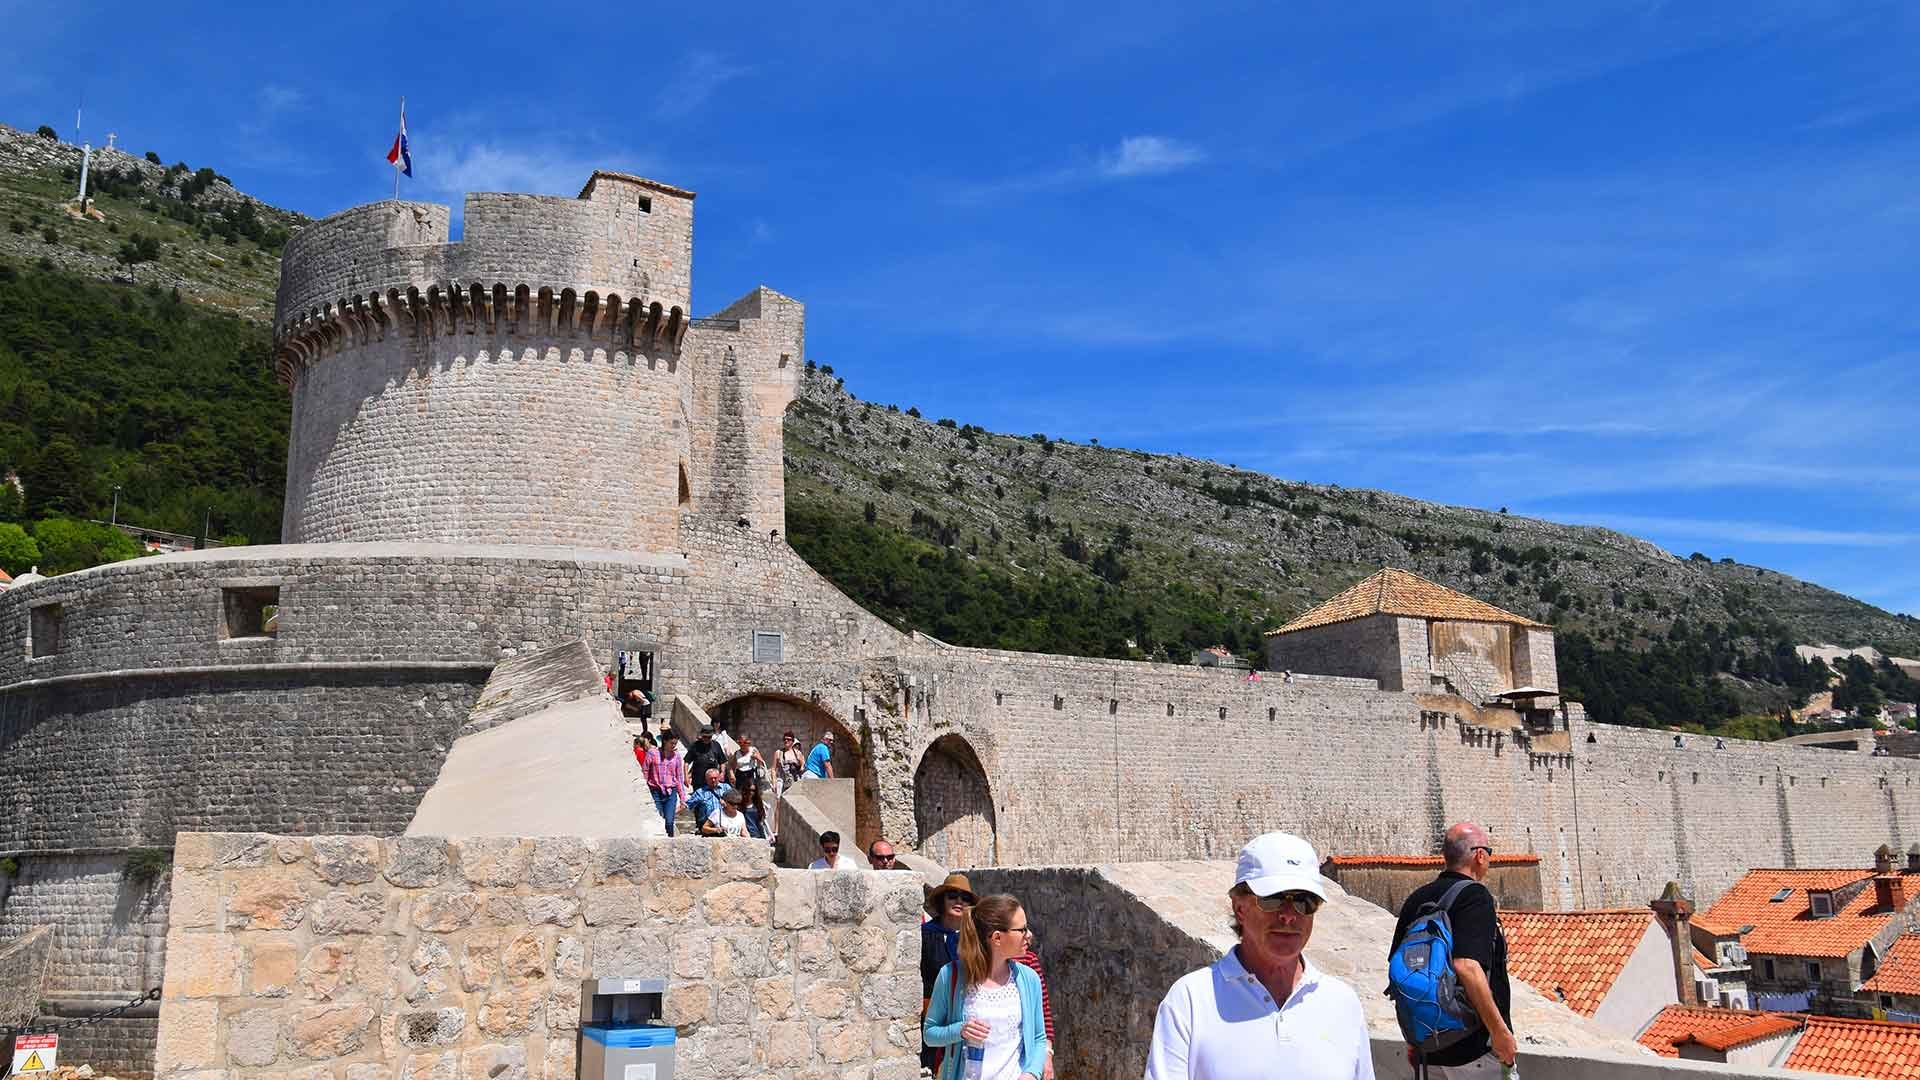 Great walls of Dubrovnik